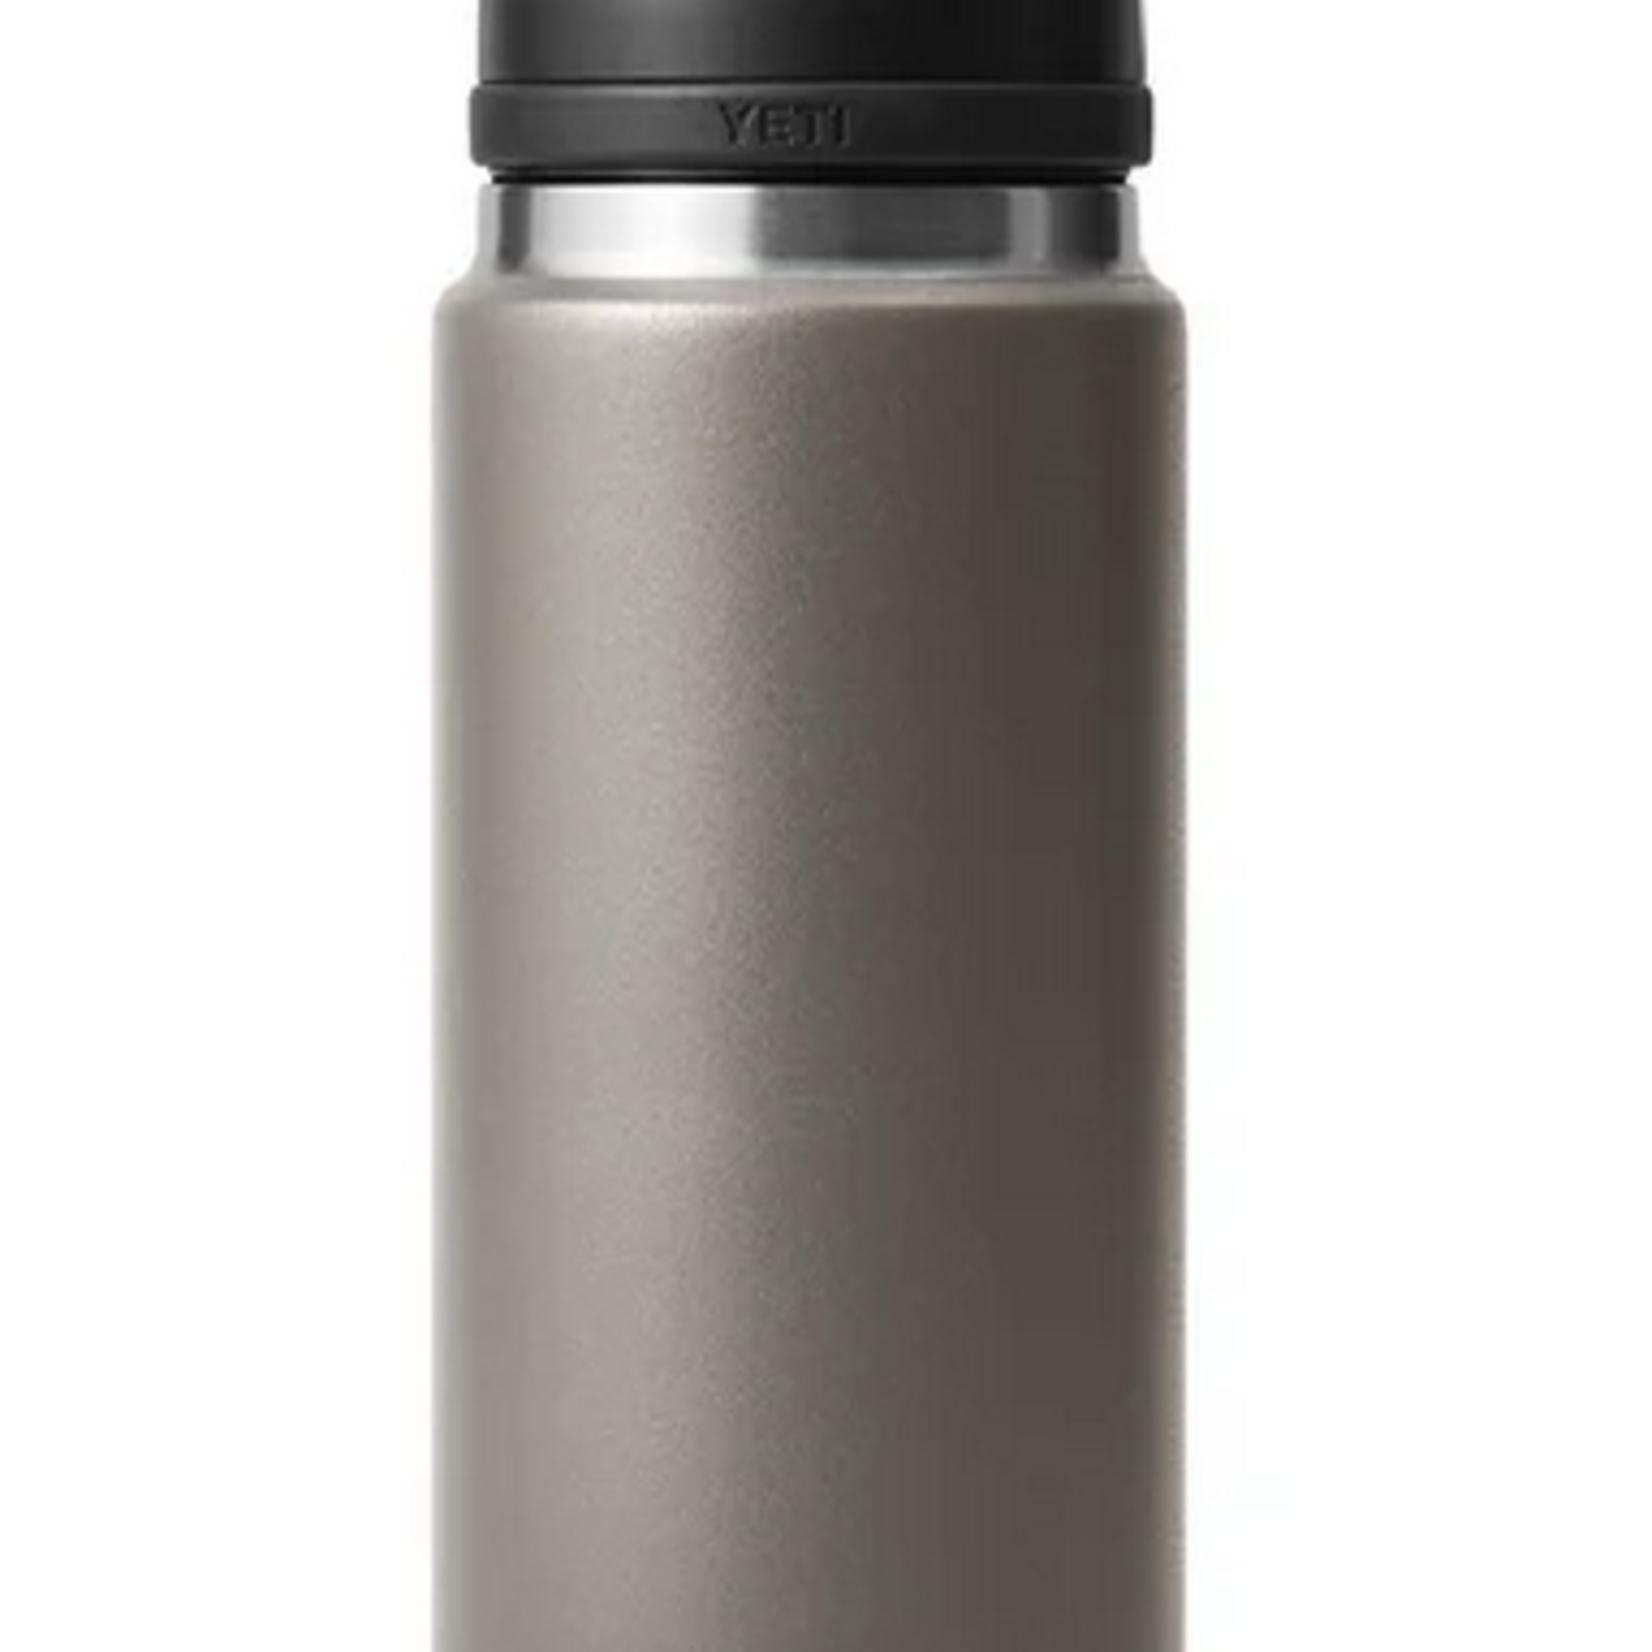 YETI Sharptail Taupe 26 oz Bottle Chug